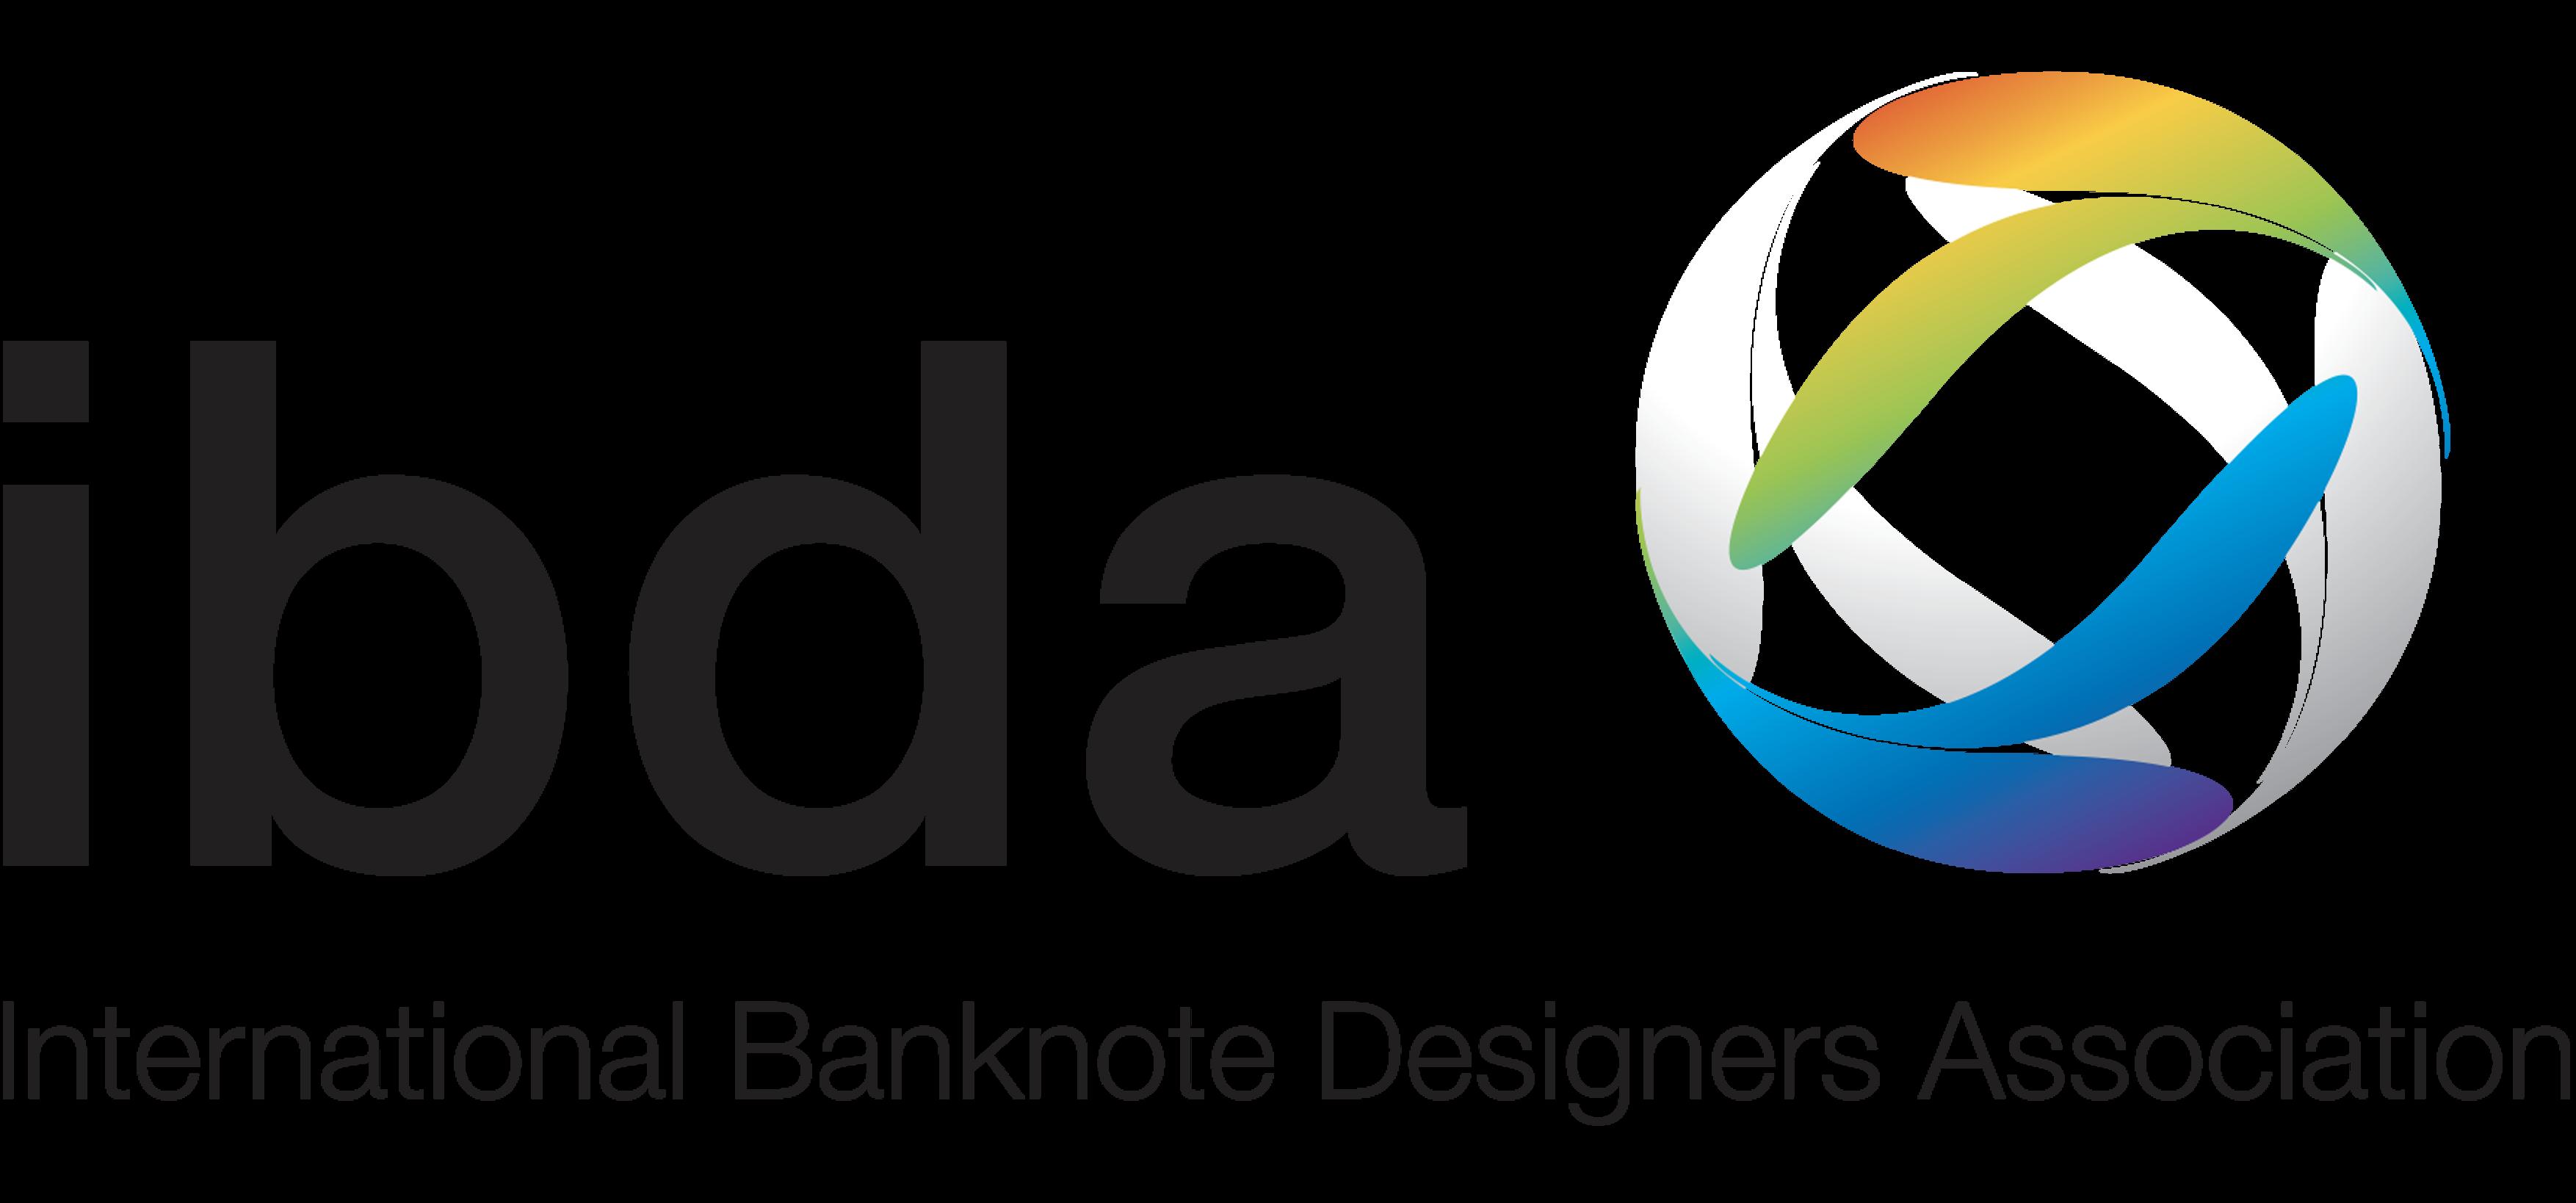 International Banknote Designers Association